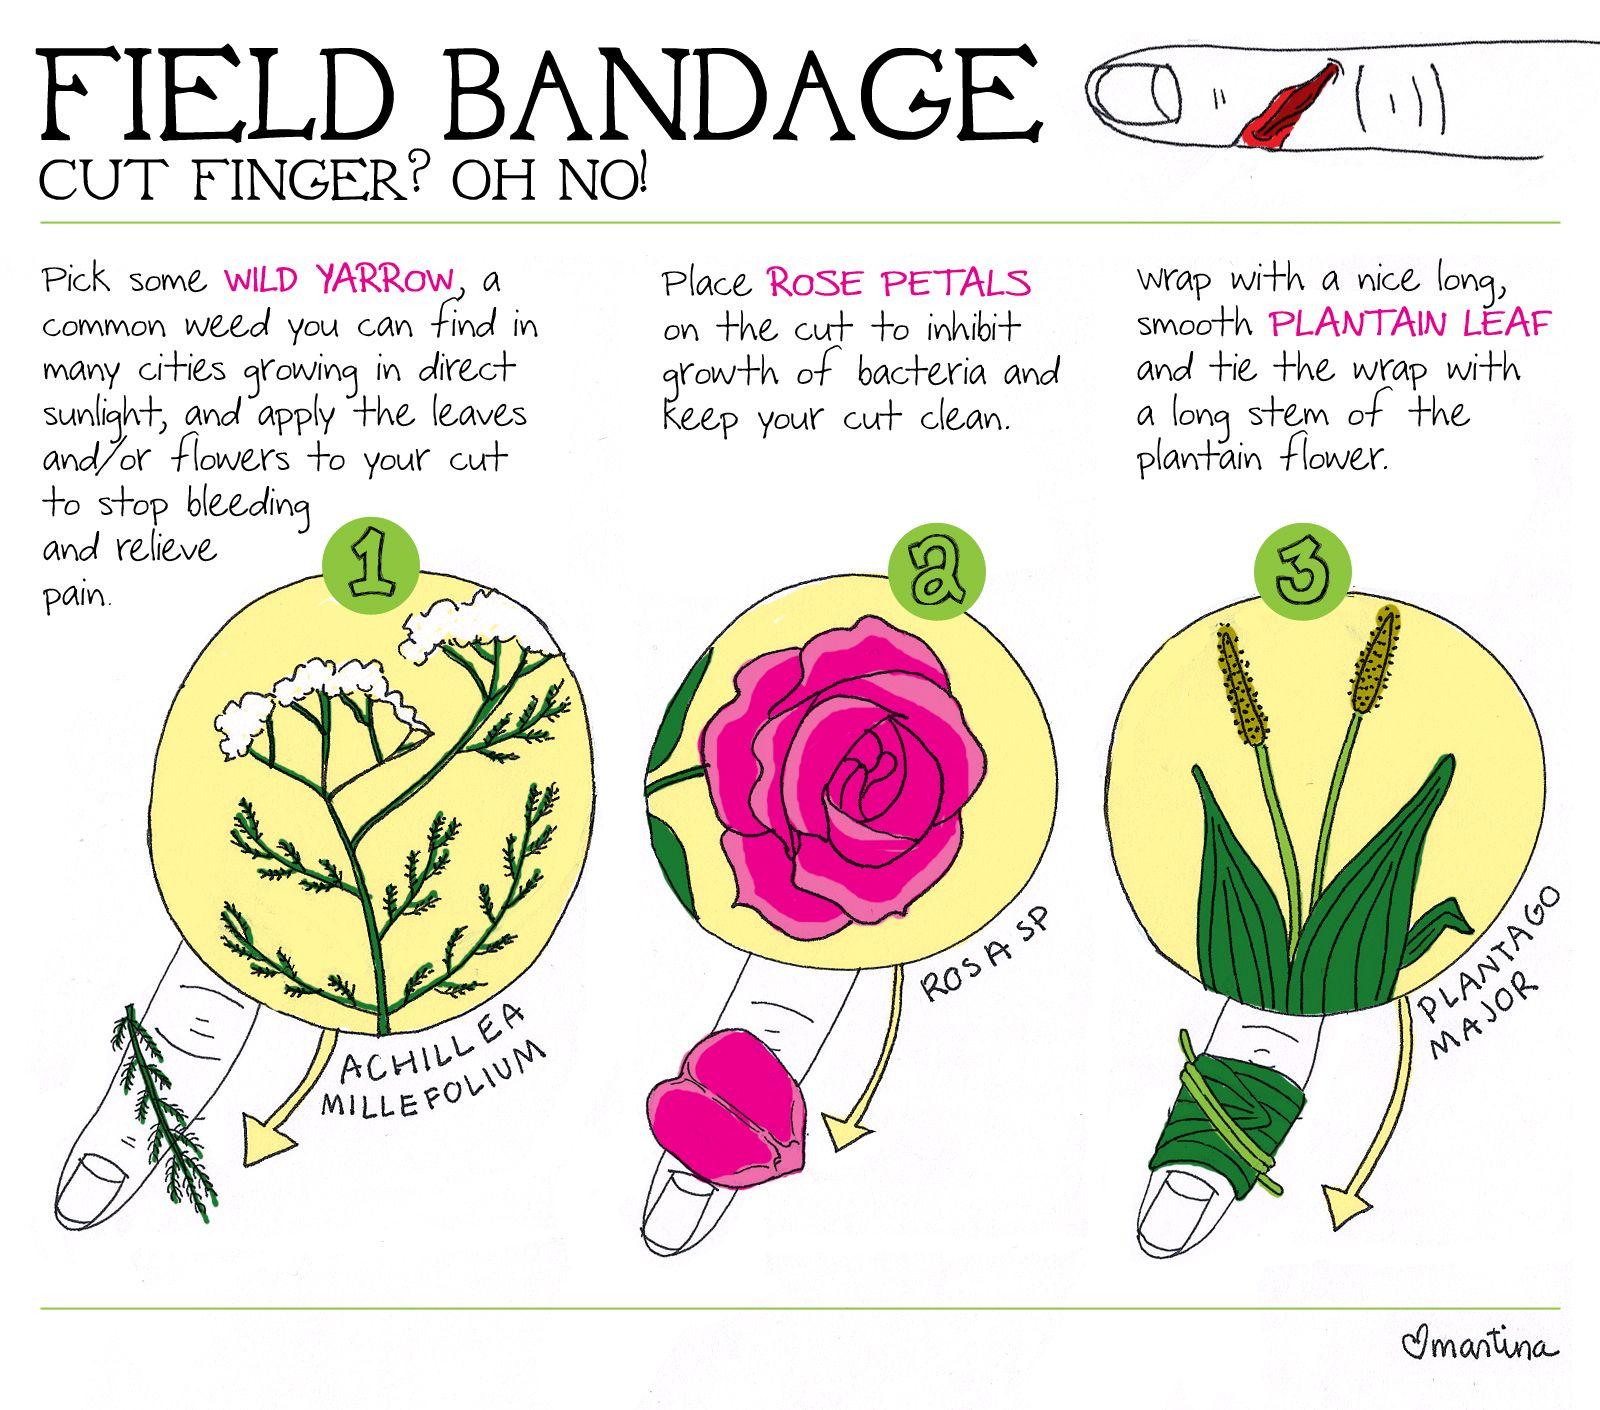 Field bandage.